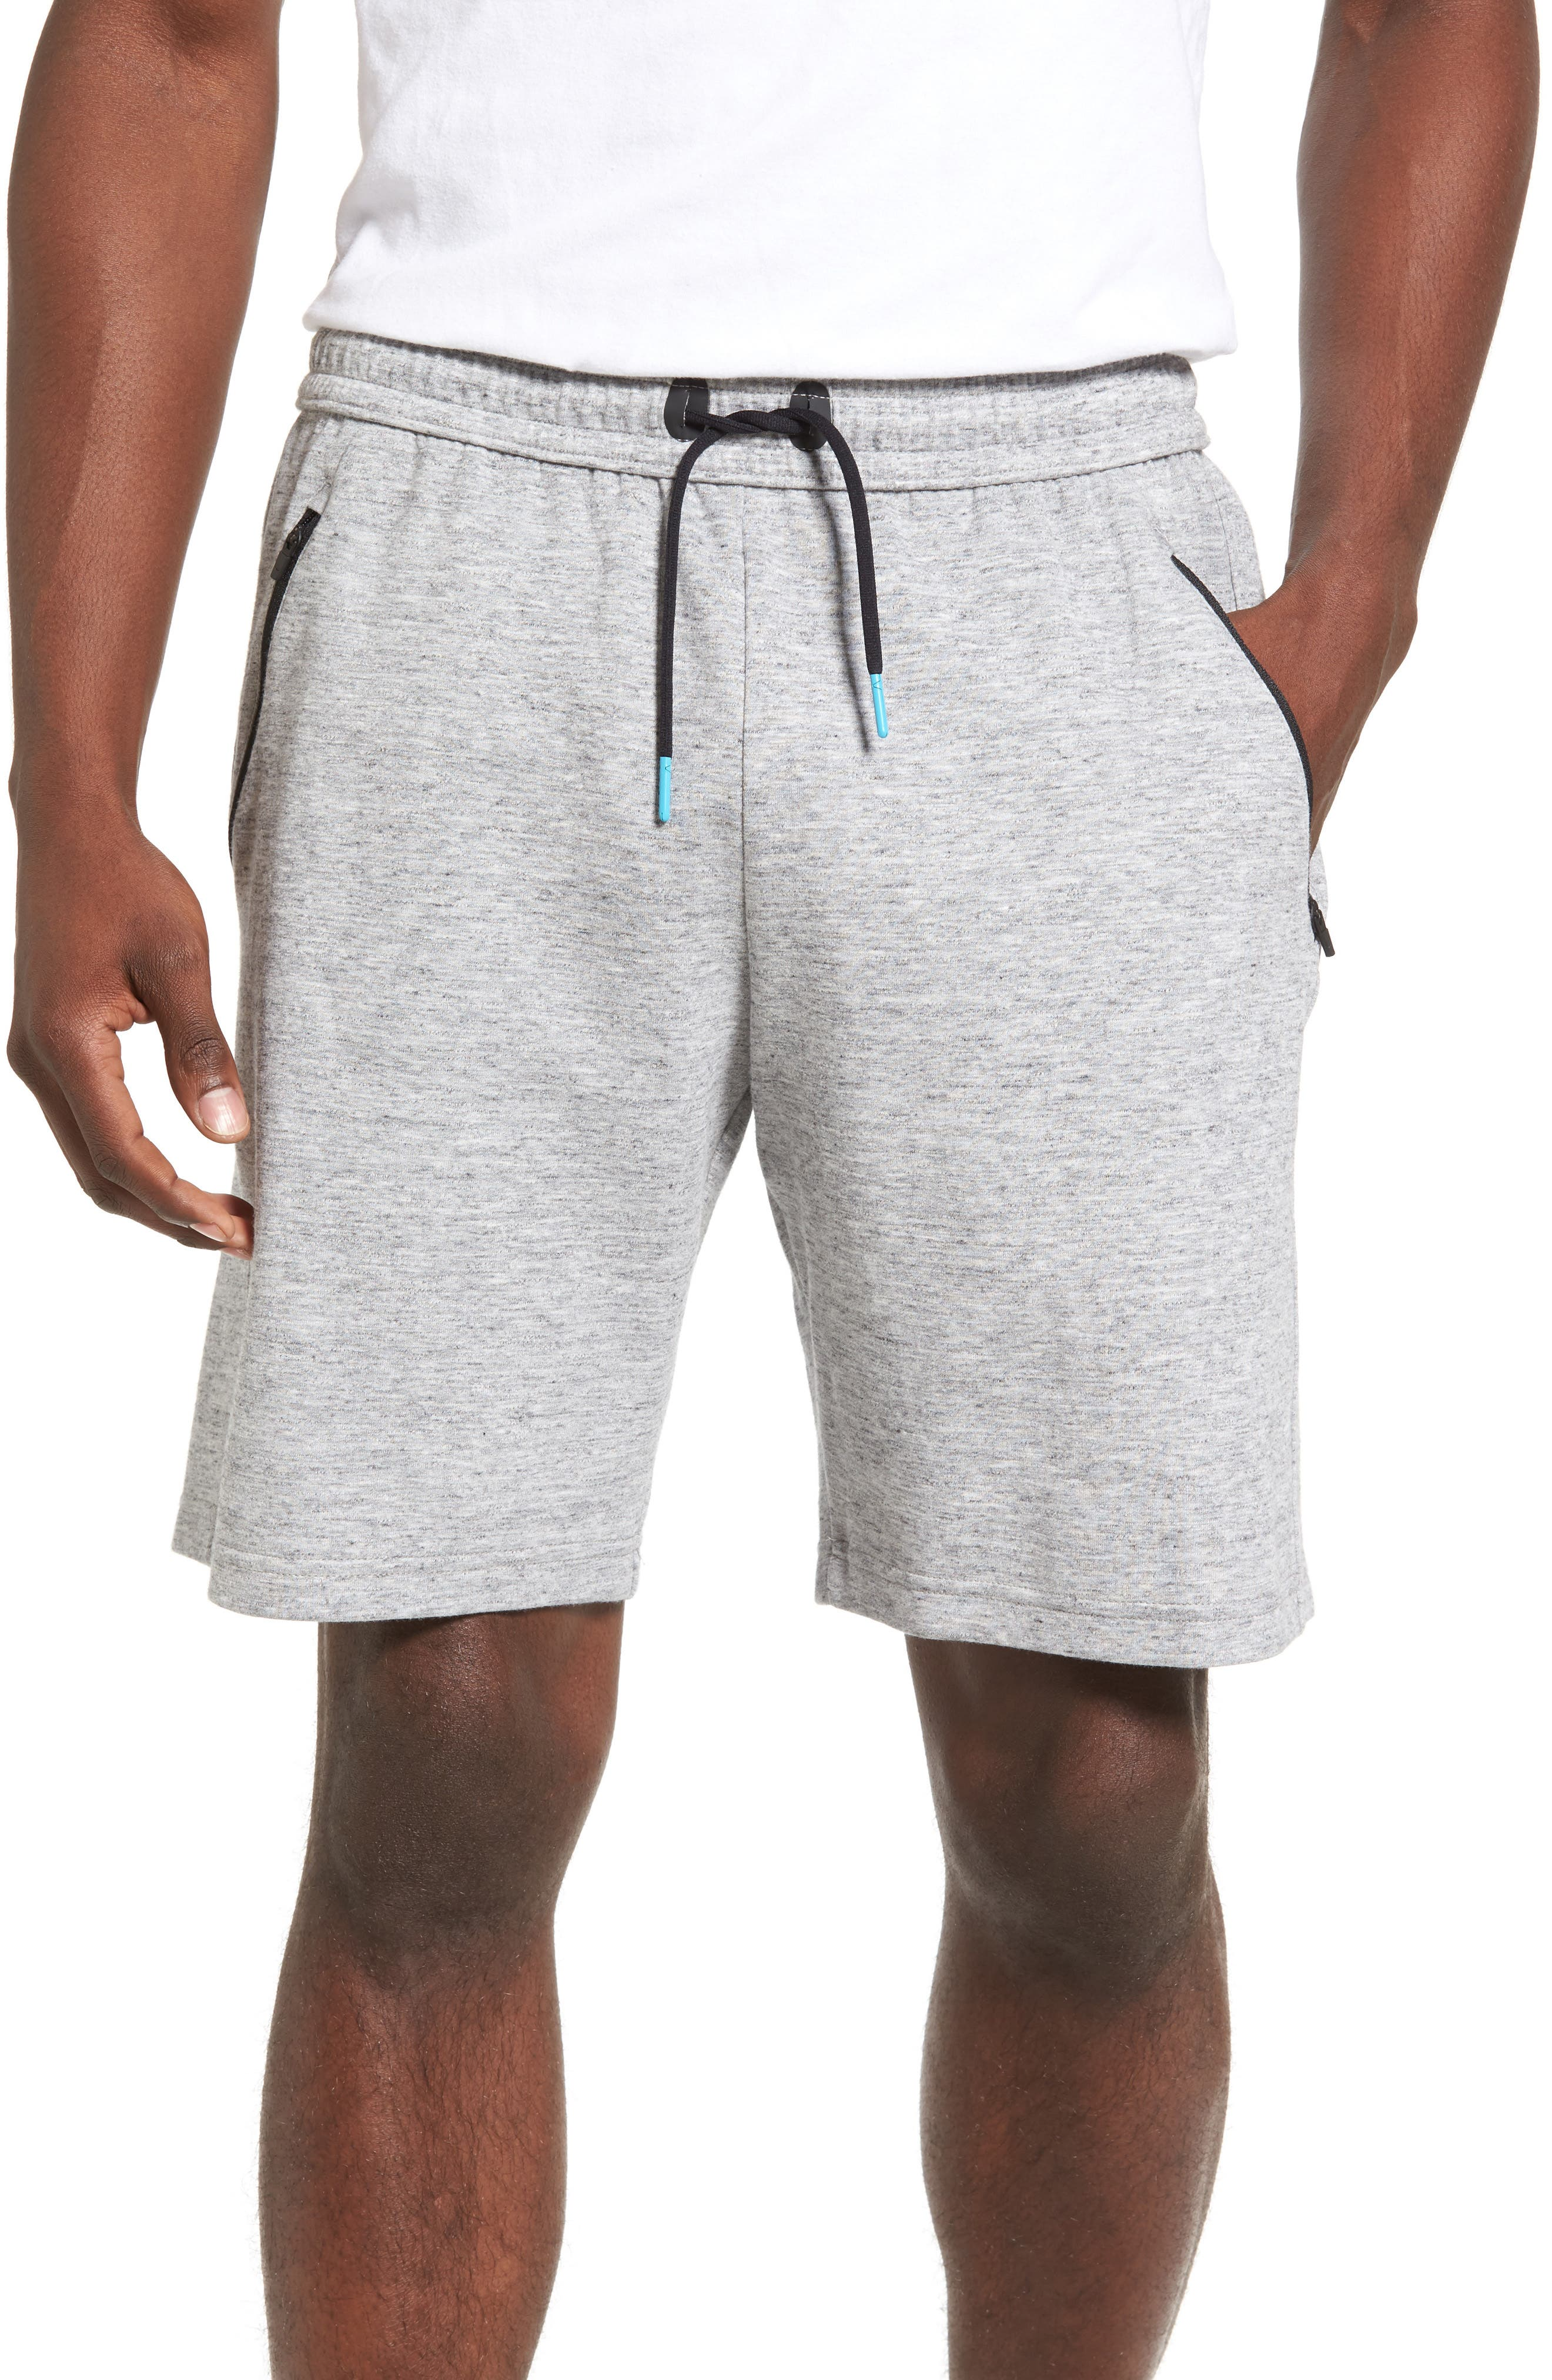 Zella Magnetite Fleece Tech Shorts